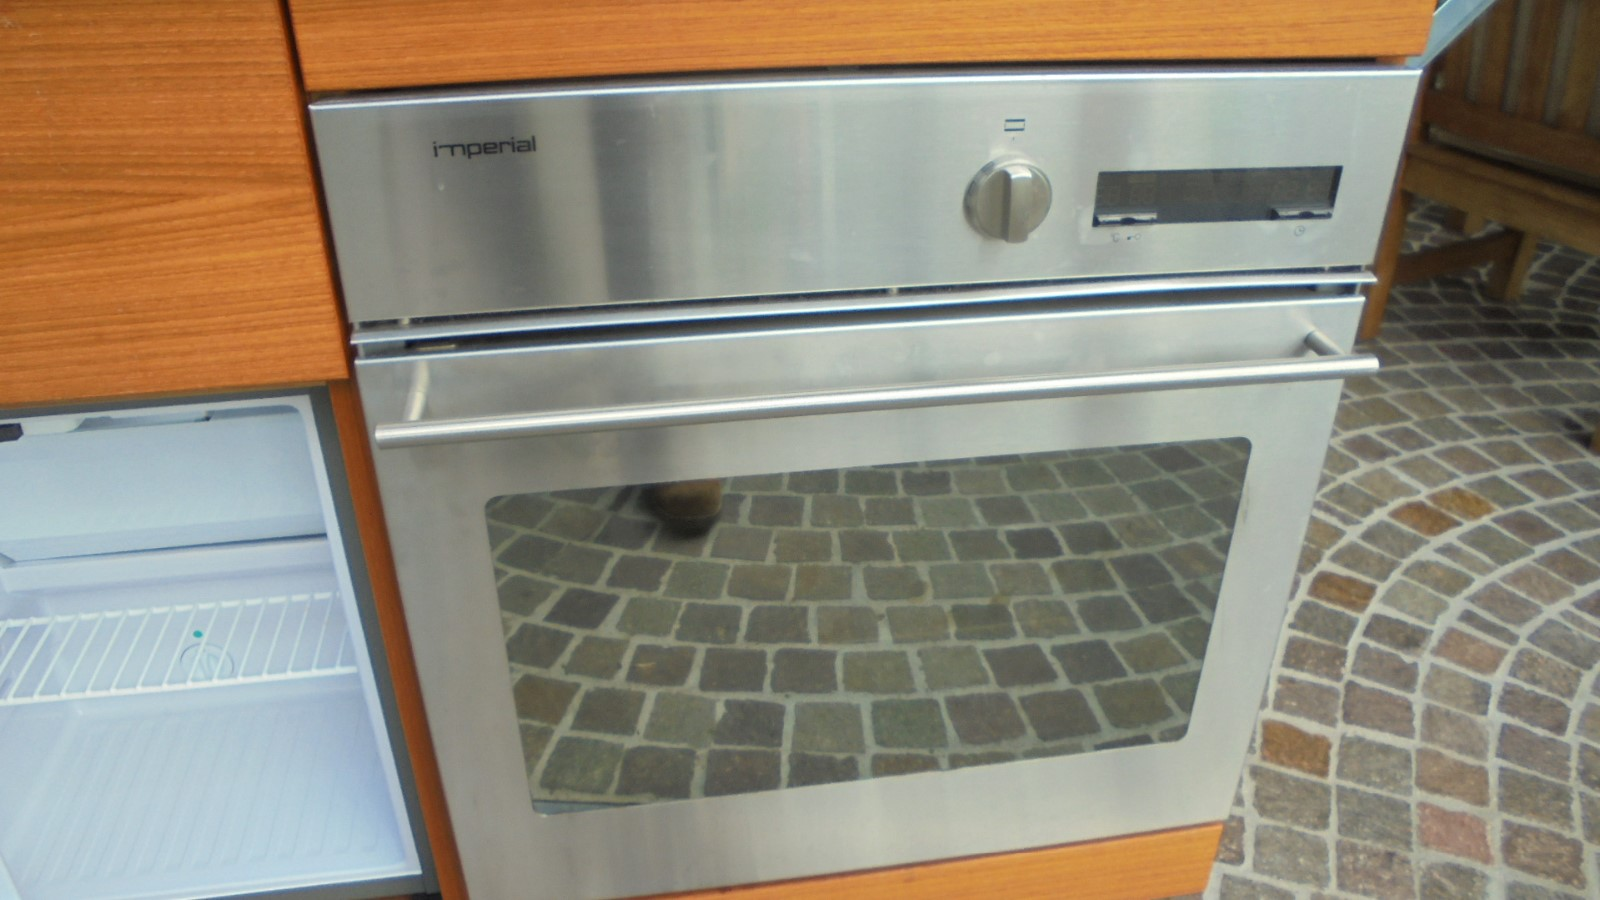 Outdoor Küche Utensilien : Outdoor küche rollbar küchenutensilien innsbruck land